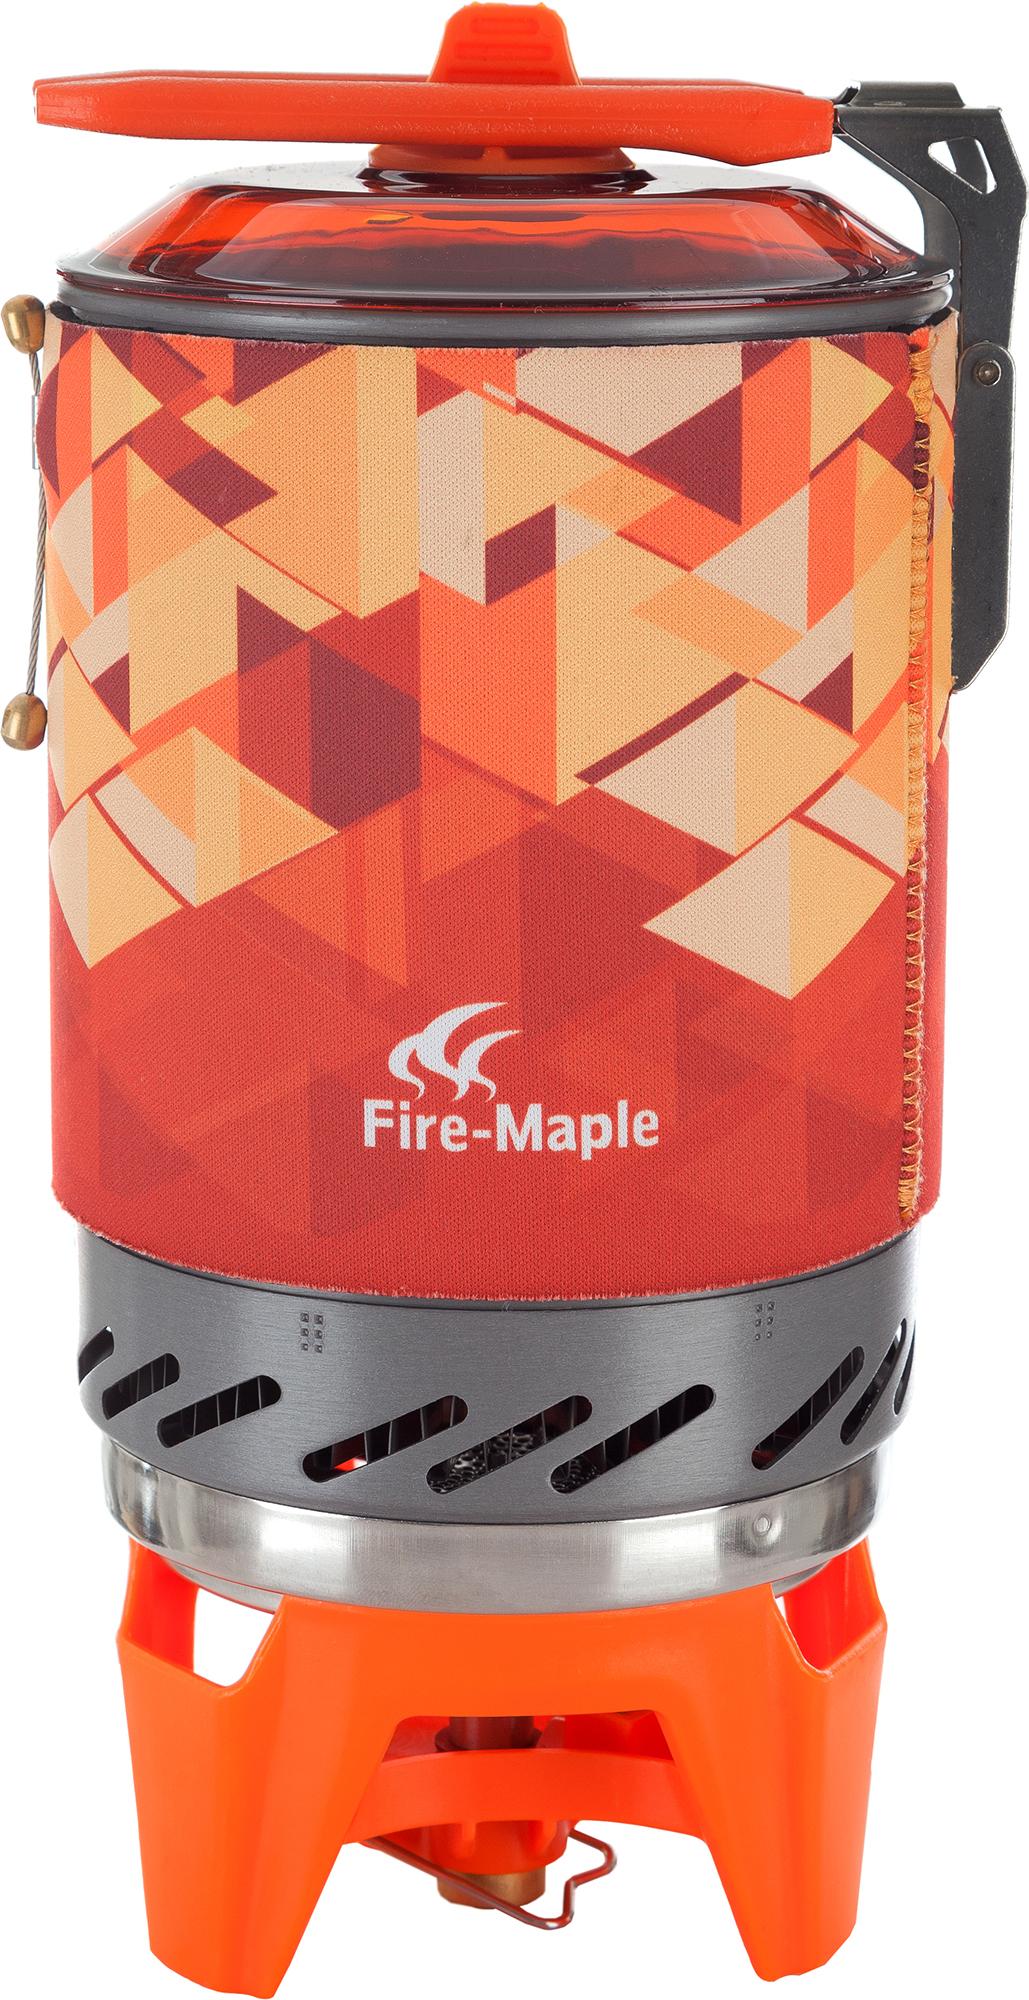 Fire-Maple Газовая горелка Fire-Maple Star X2